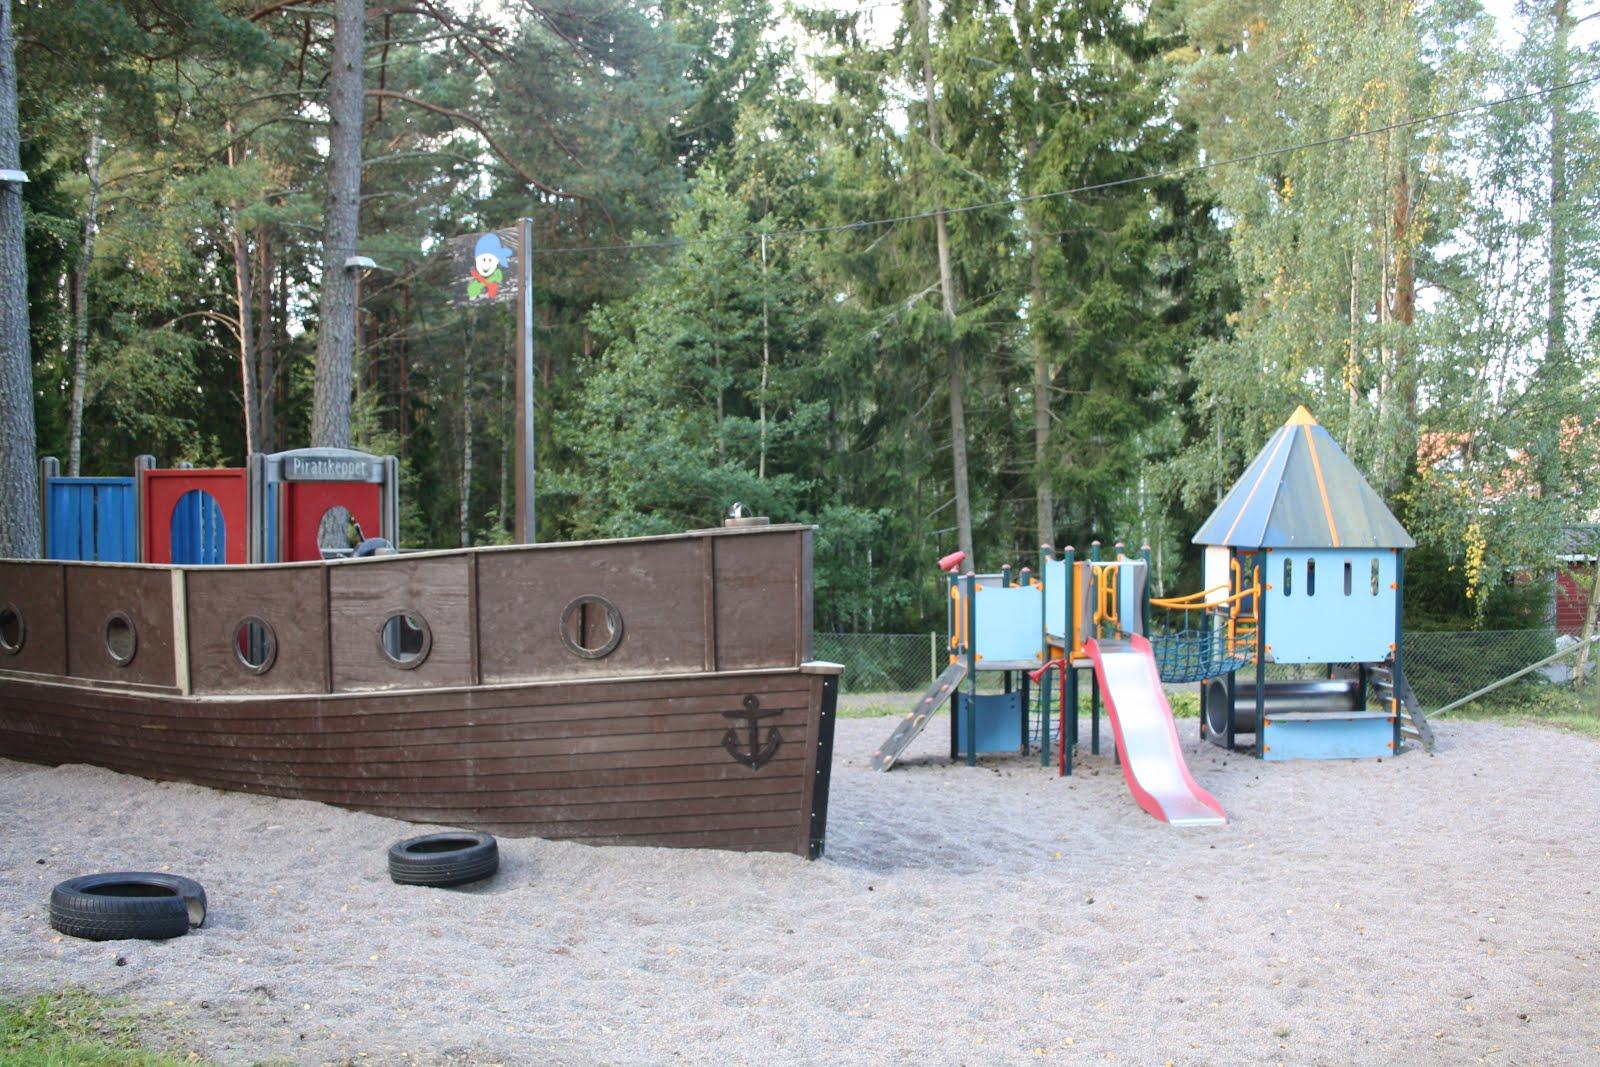 Förskolan Piratskeppet